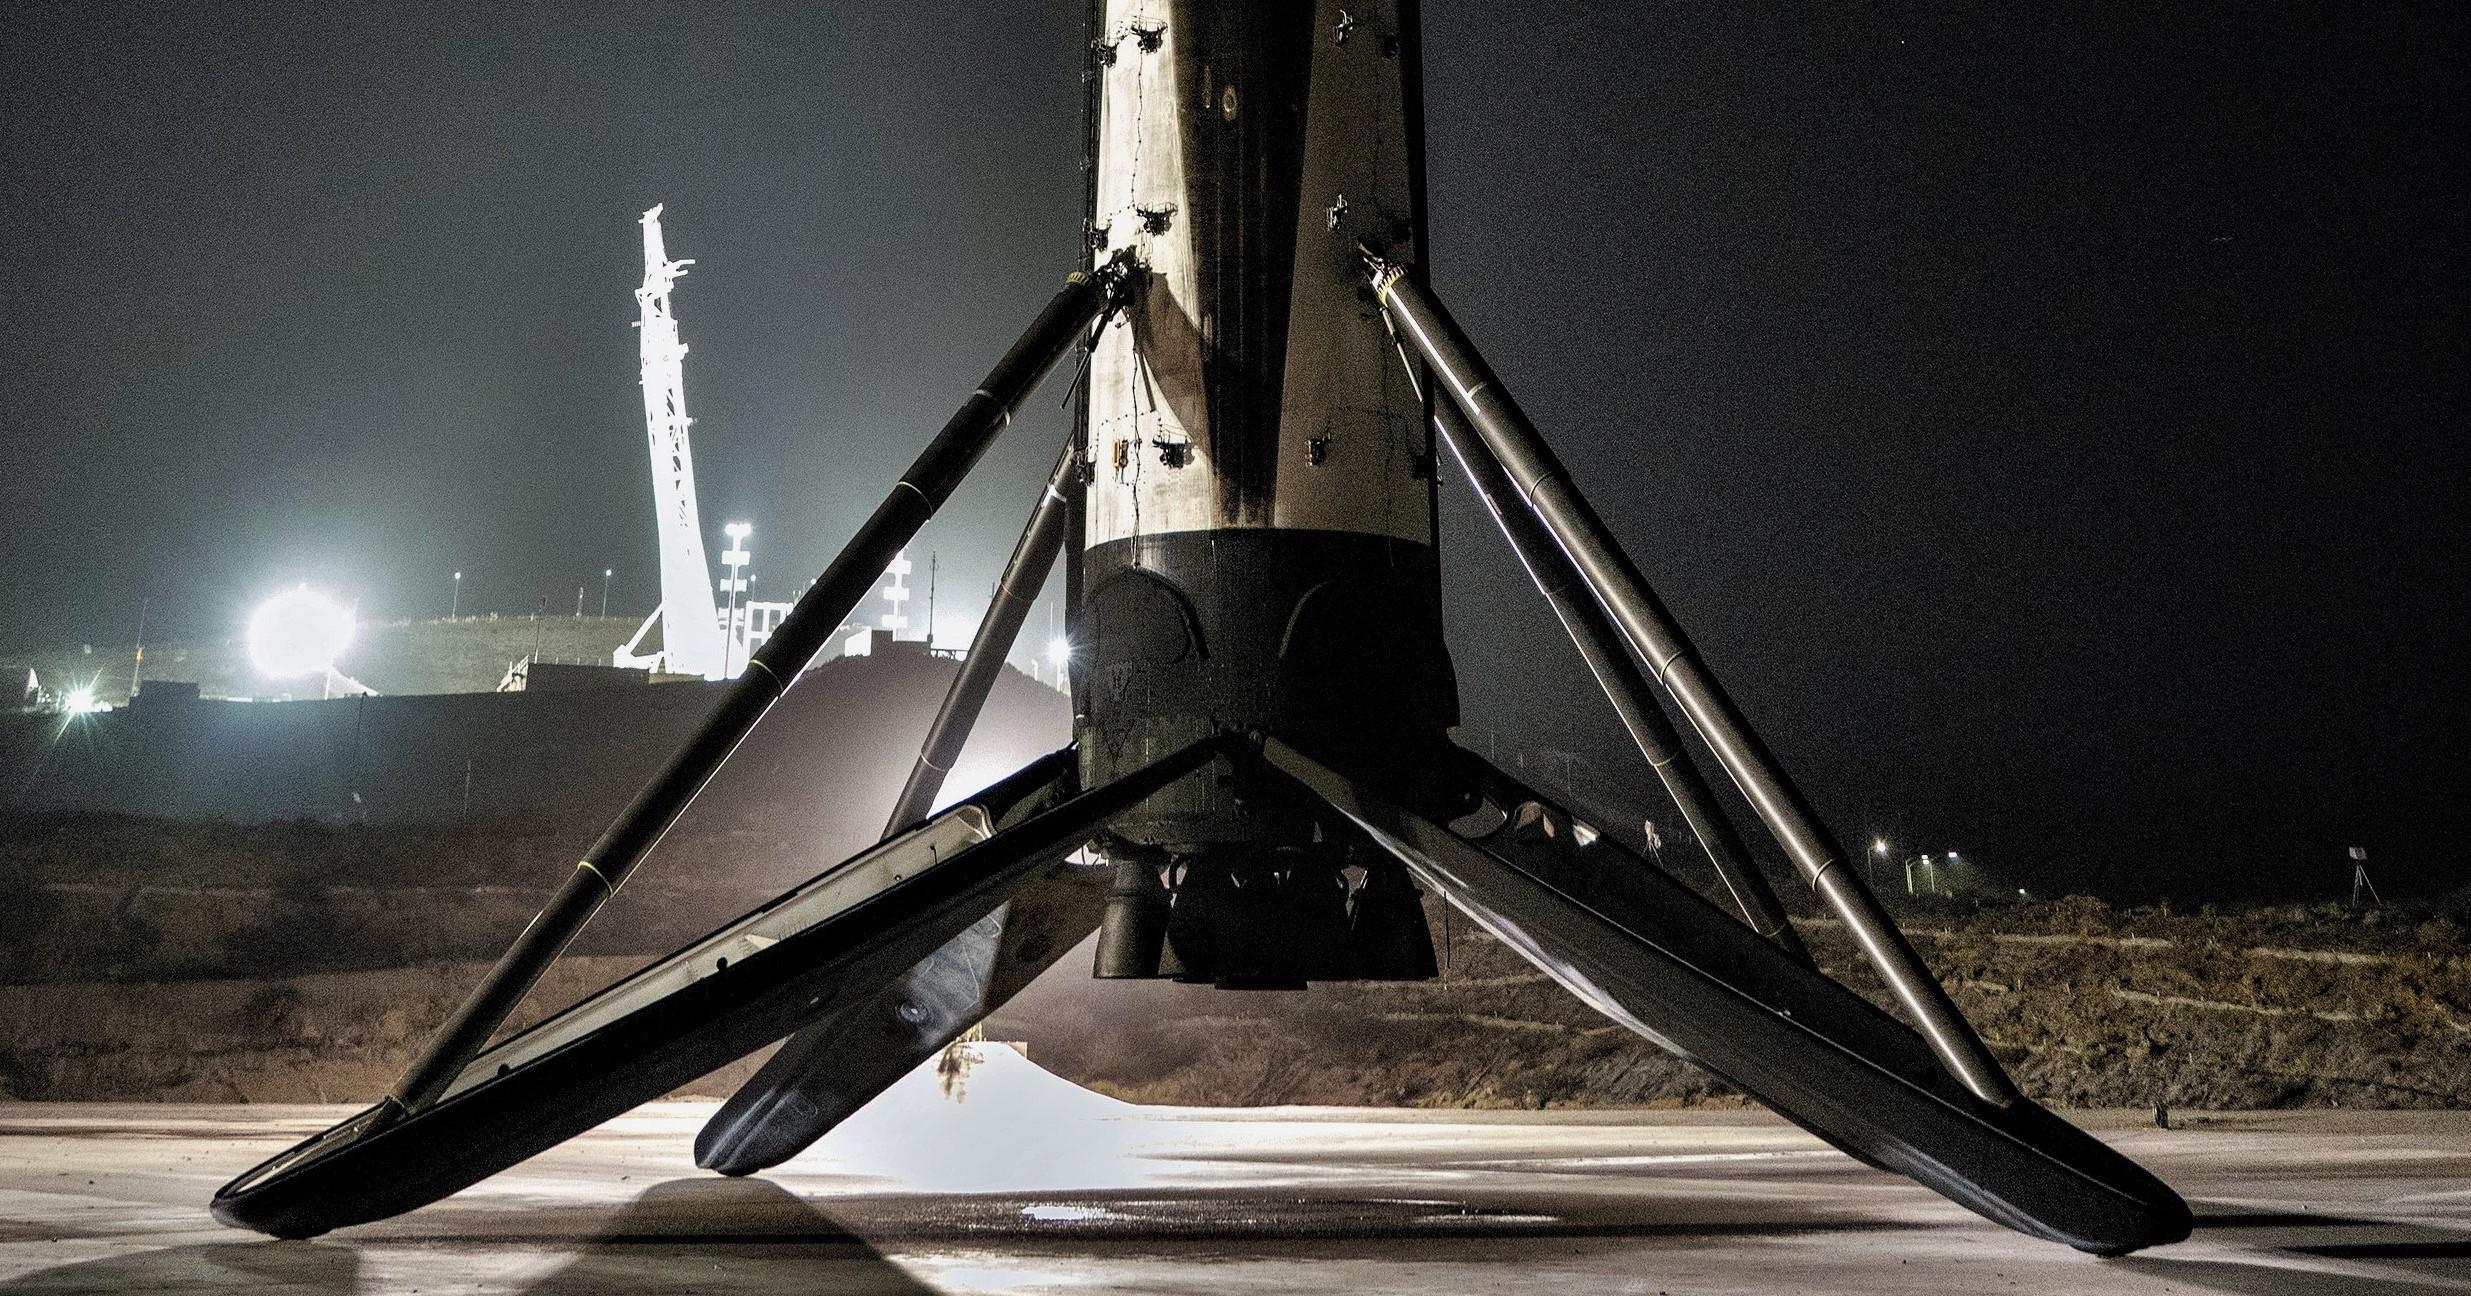 SAOCOM 1A B1048 landing (SpaceX) 6 crop